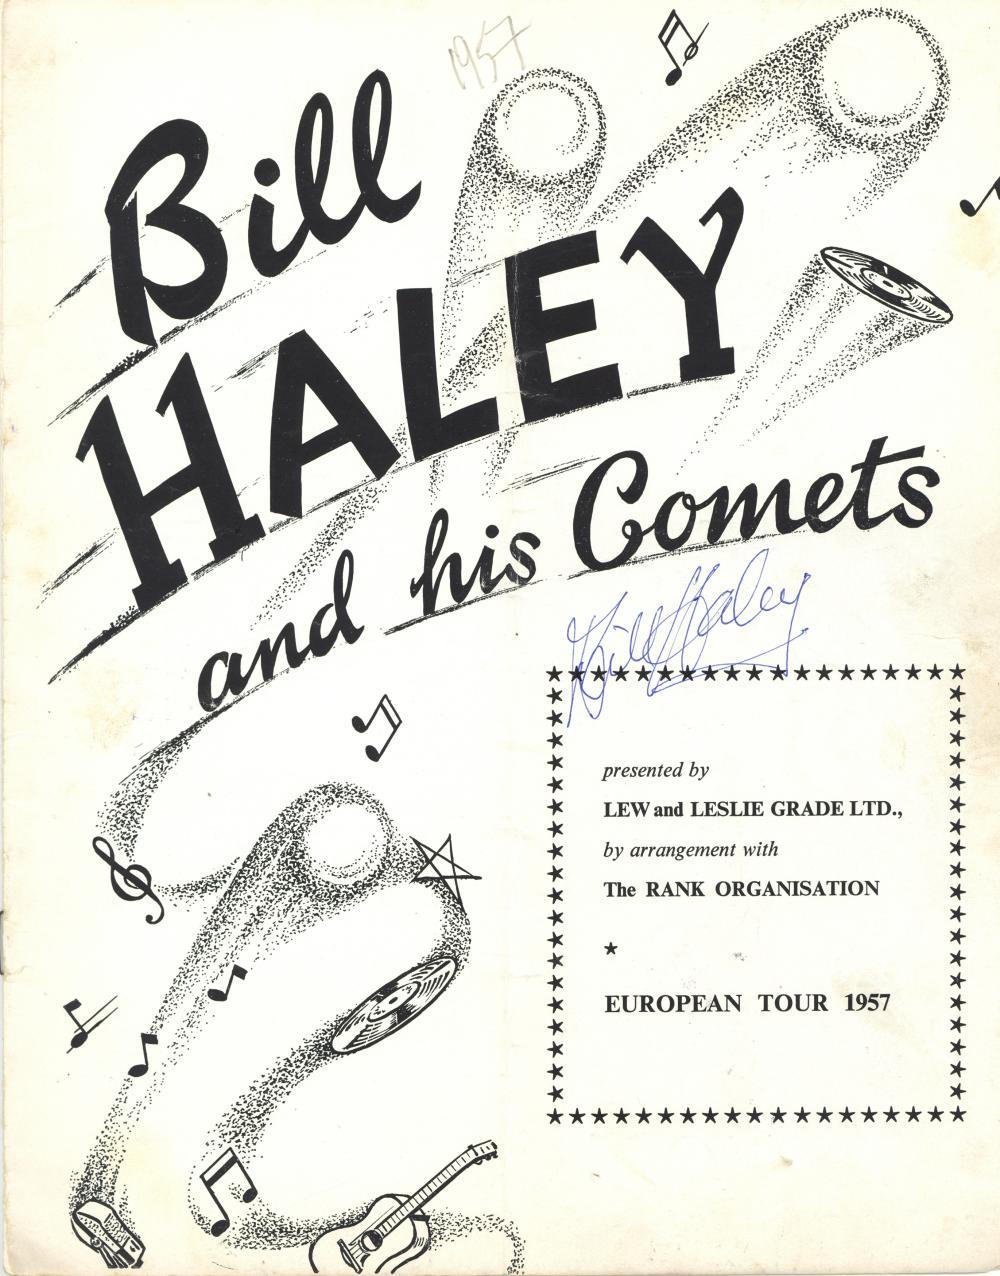 Haley (Bill)